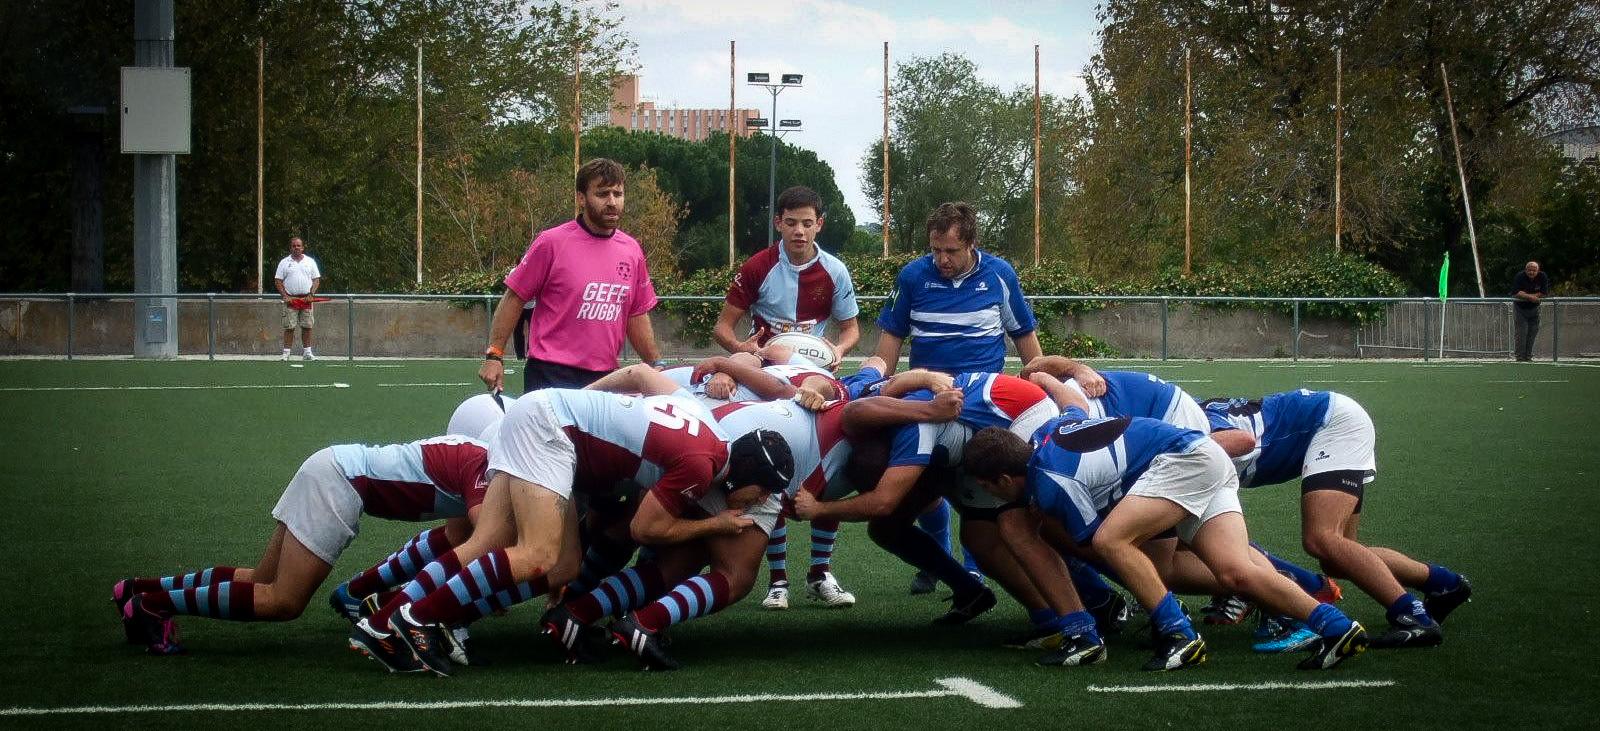 2015-10-31-rugby-madrid-sirc-glorioso-olimpico-portada